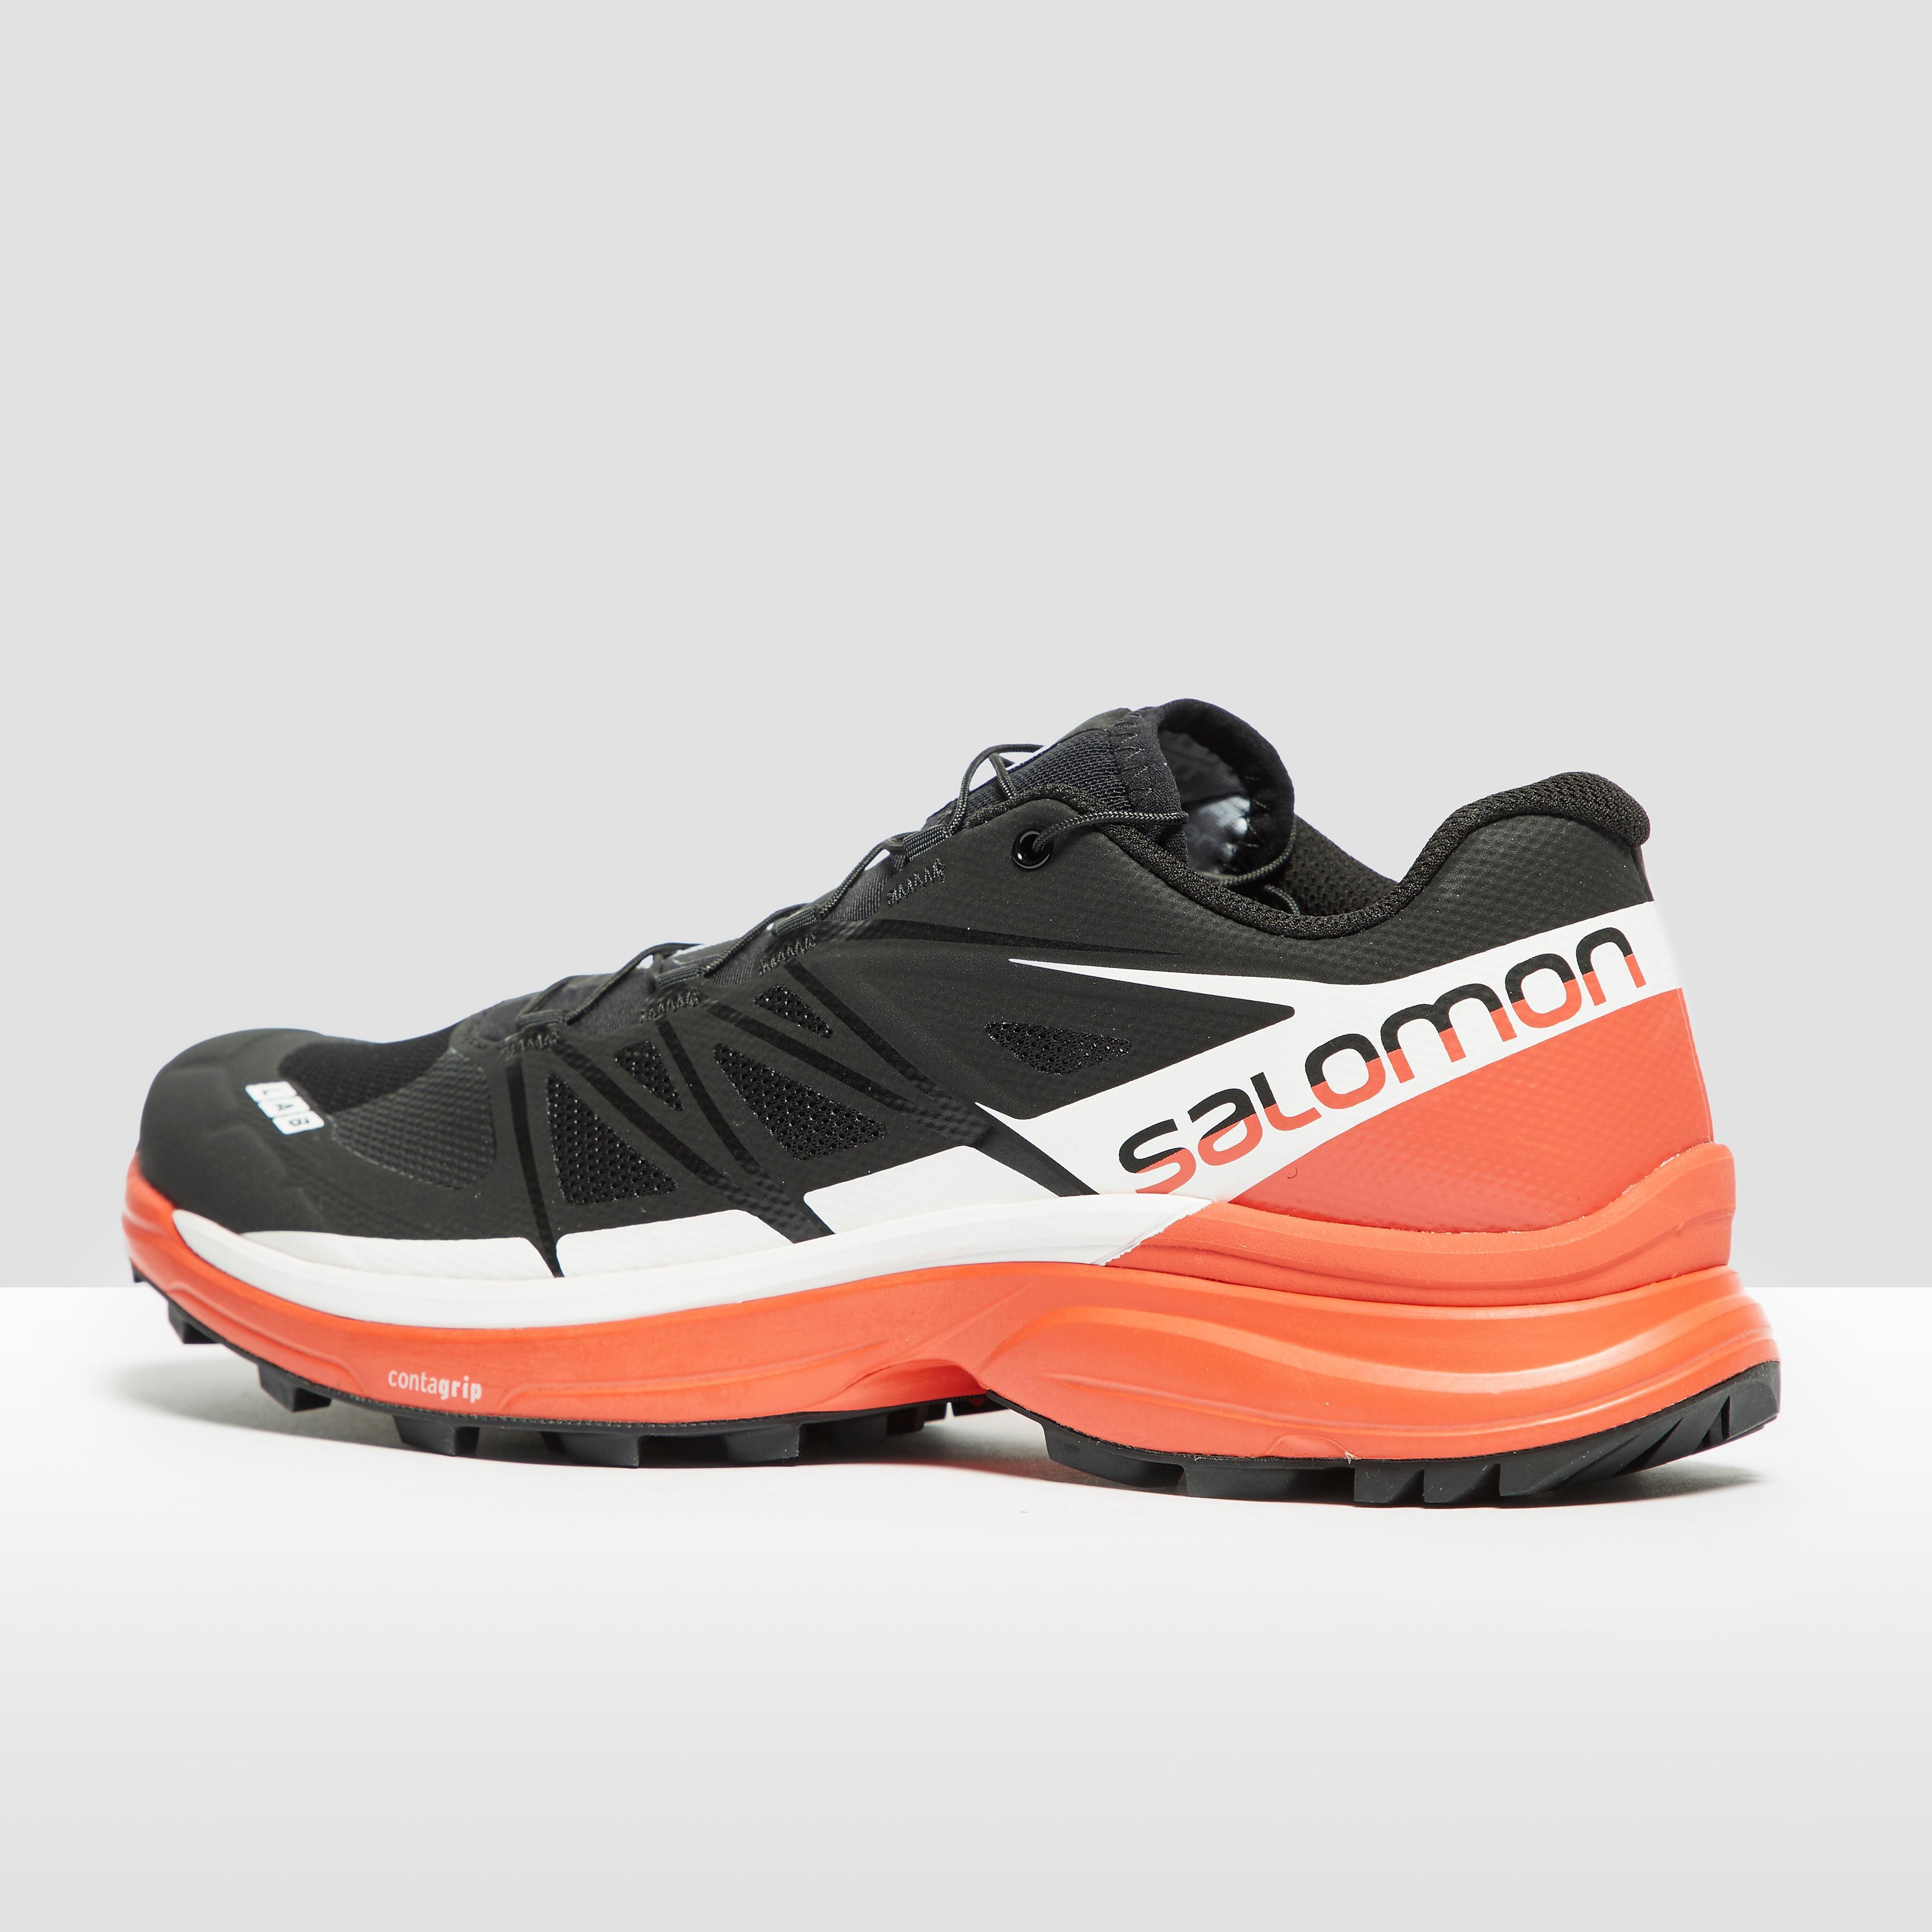 Salomon S-LAB WINGS 8 SG Men's Trail Running Shoe